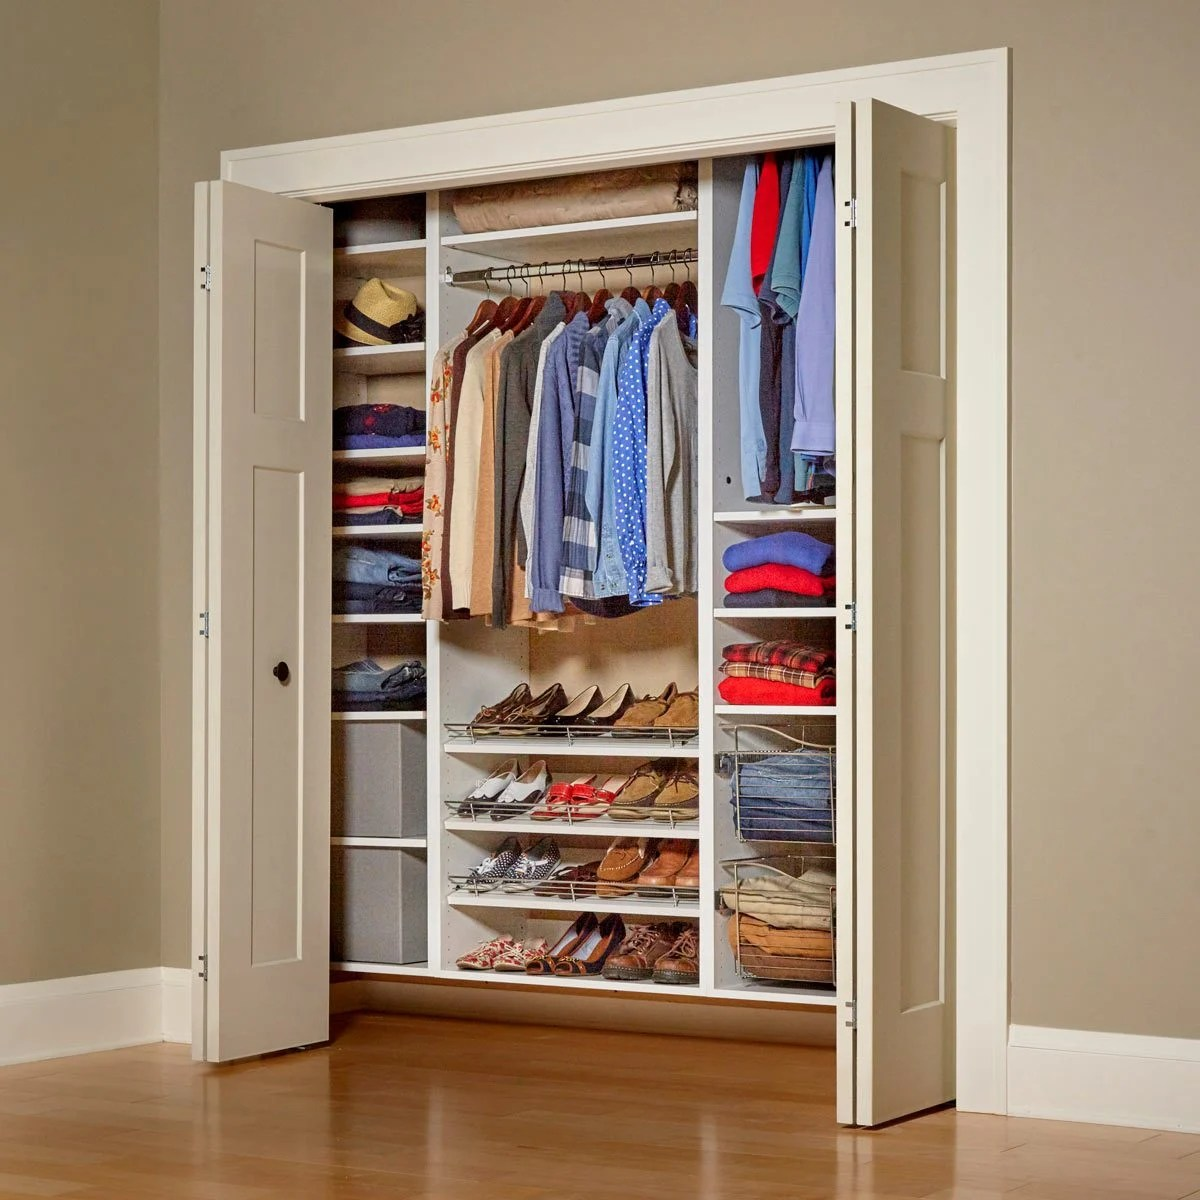 Build Your Own Melamine Closet Organizer Family Handyman